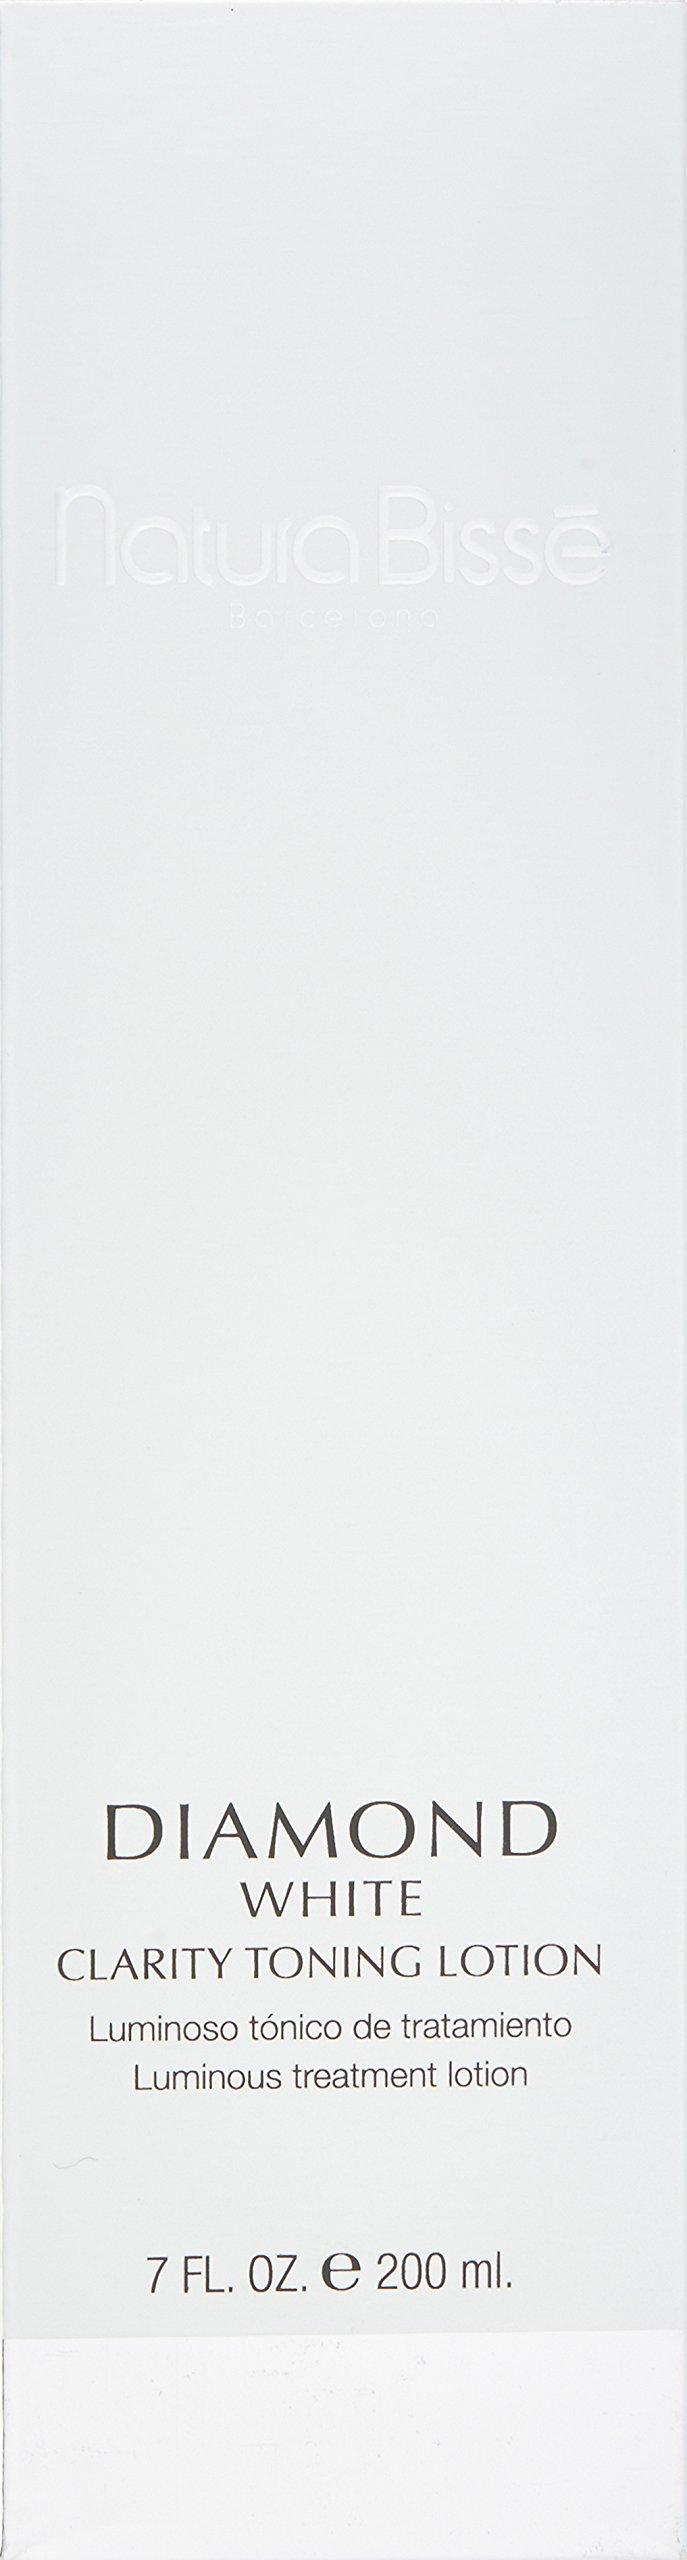 Natura Bisse Diamond White Clarity Toning Lotion, 7.0 fl. oz. by Natura Bisse (Image #3)